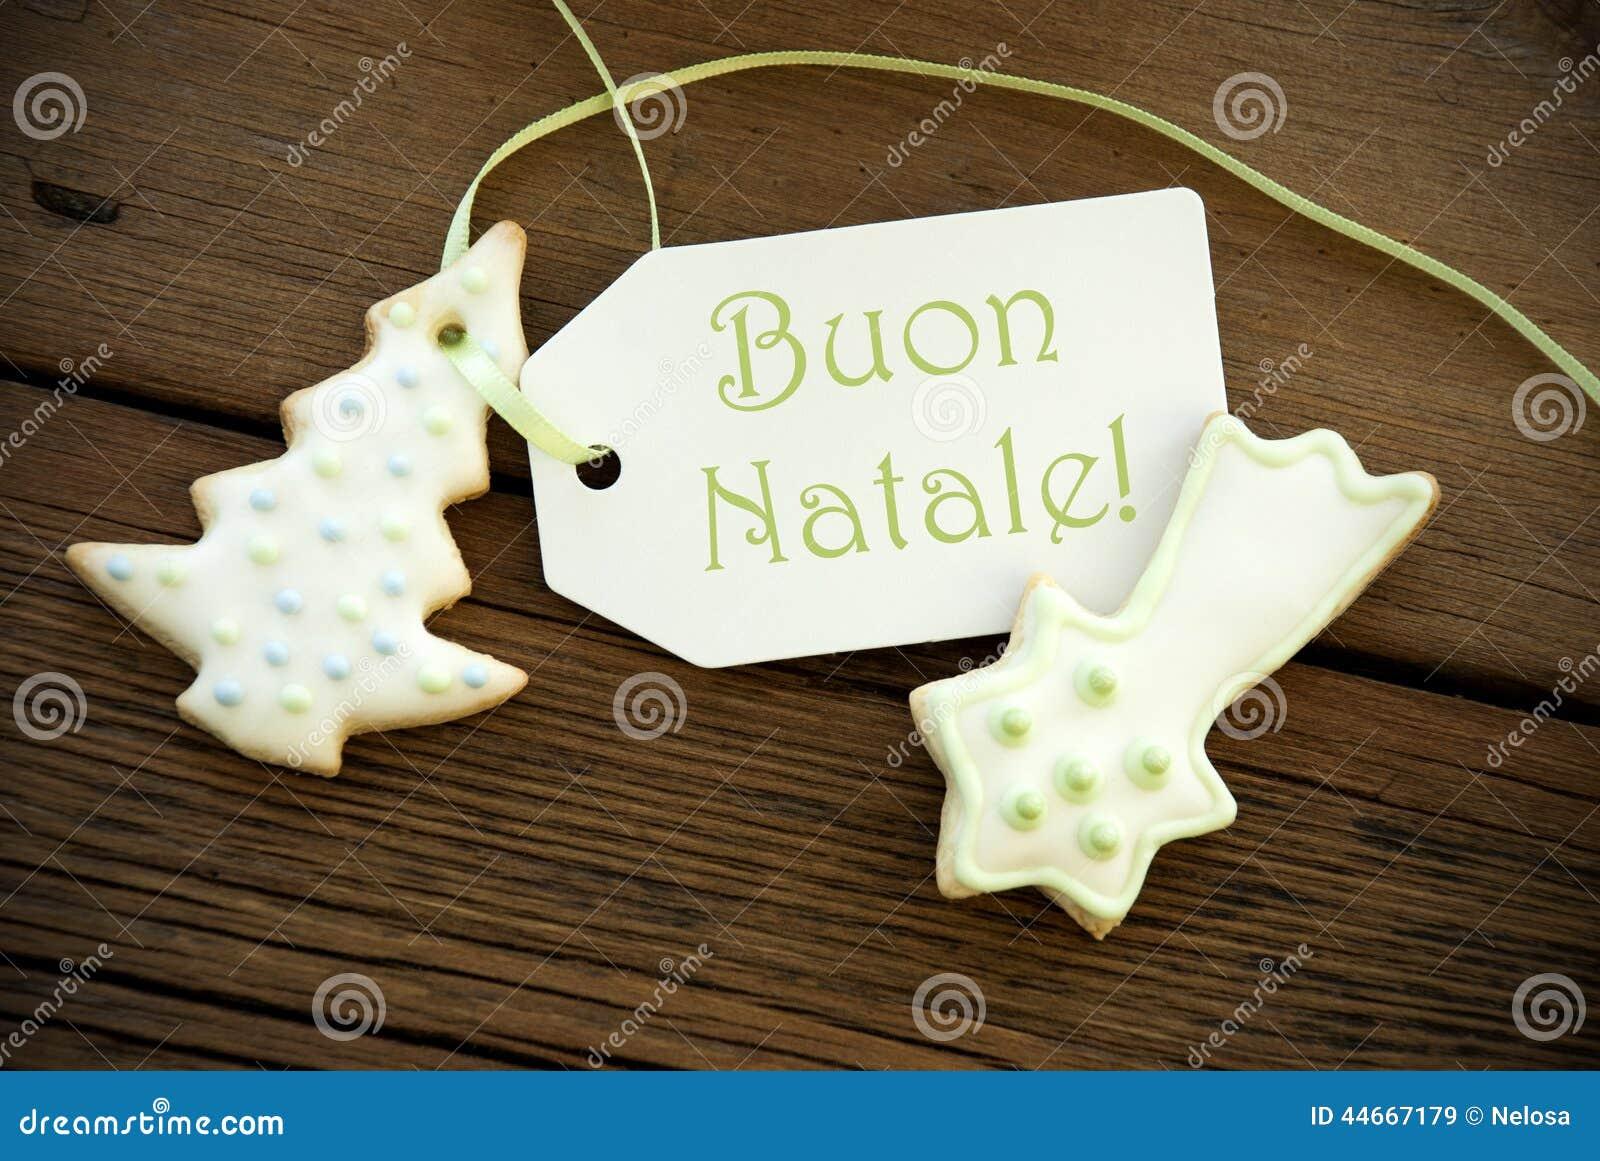 Italian Christmas Greetings Stock Image Image Of Season Greeting